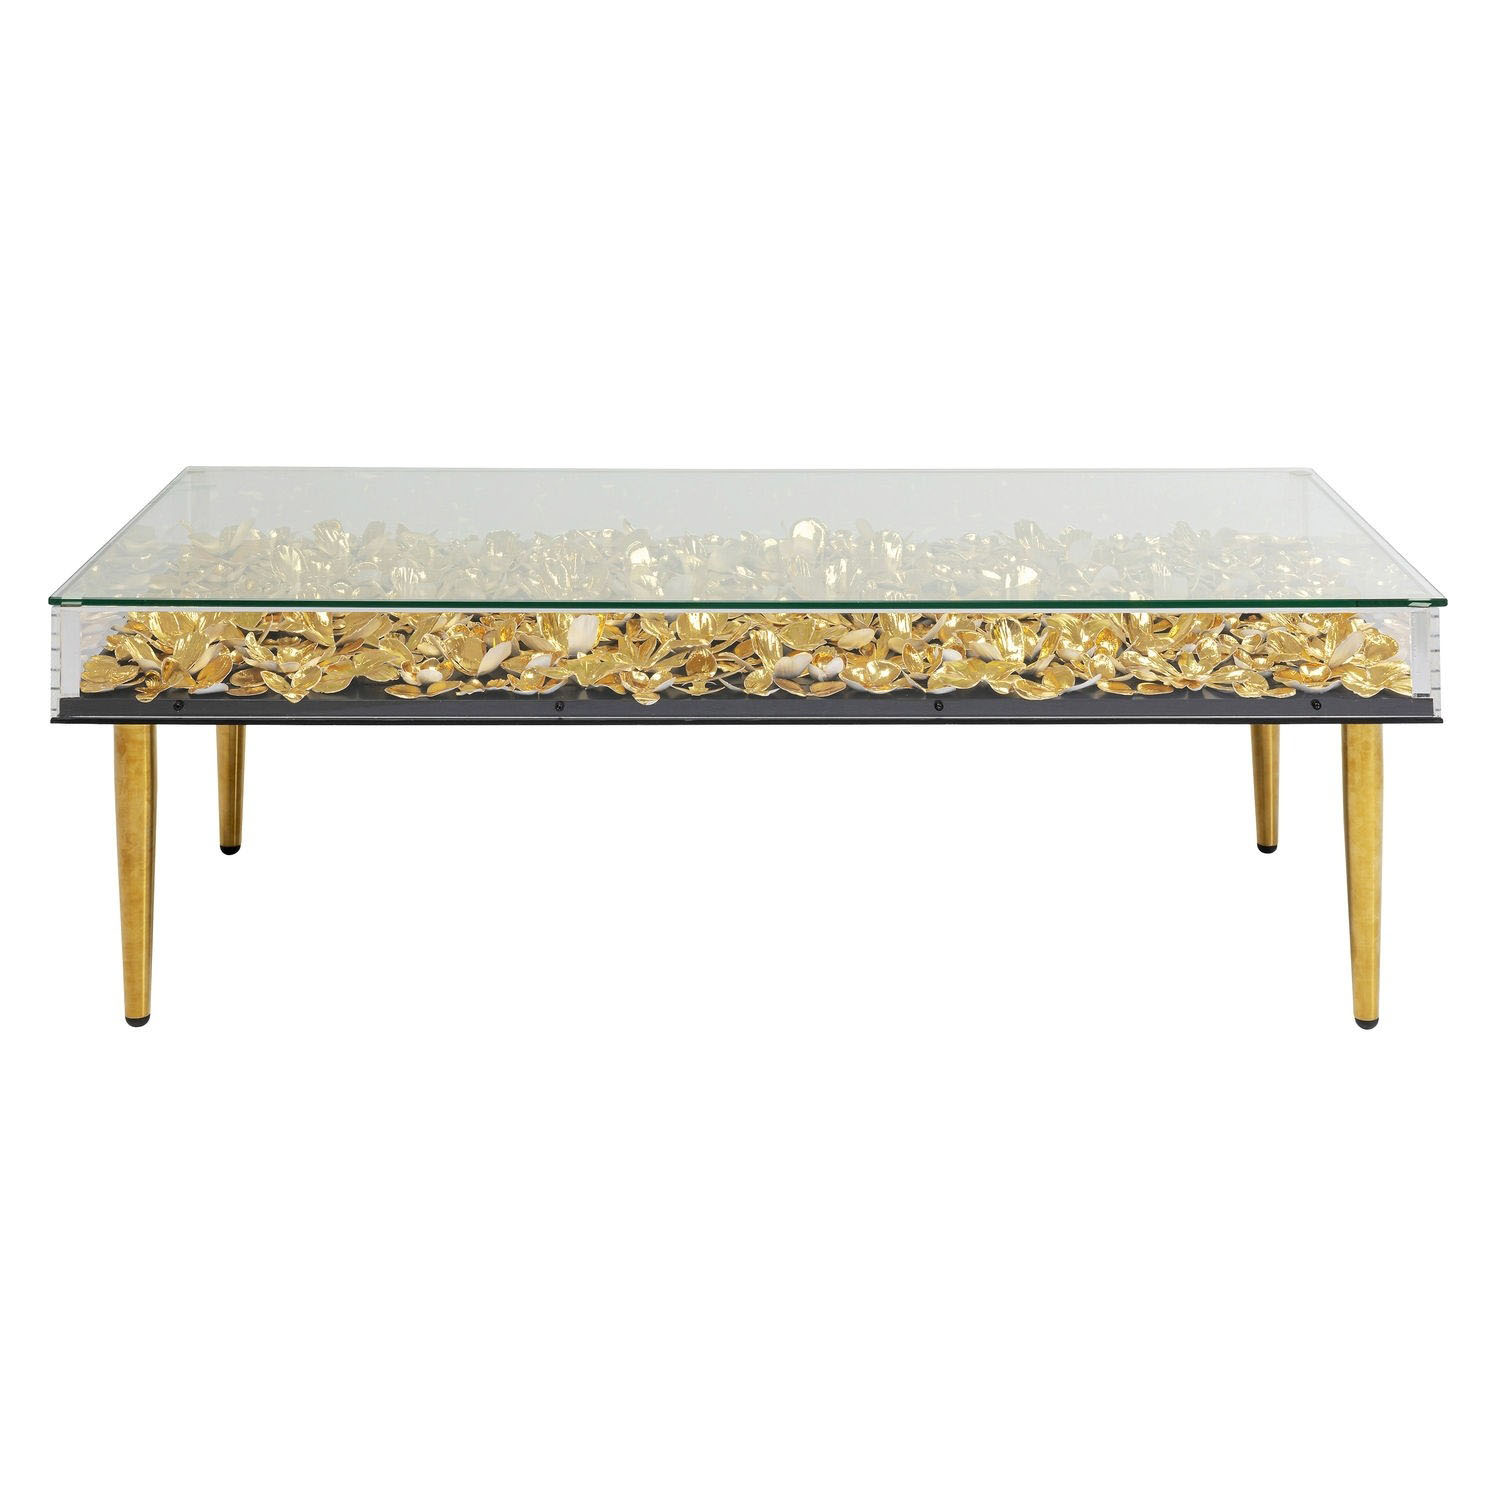 Kare Design Rektangulær Gold Flowers Sofabord - Klar Akryl Og Messing Stål (120X60) Dagligstue